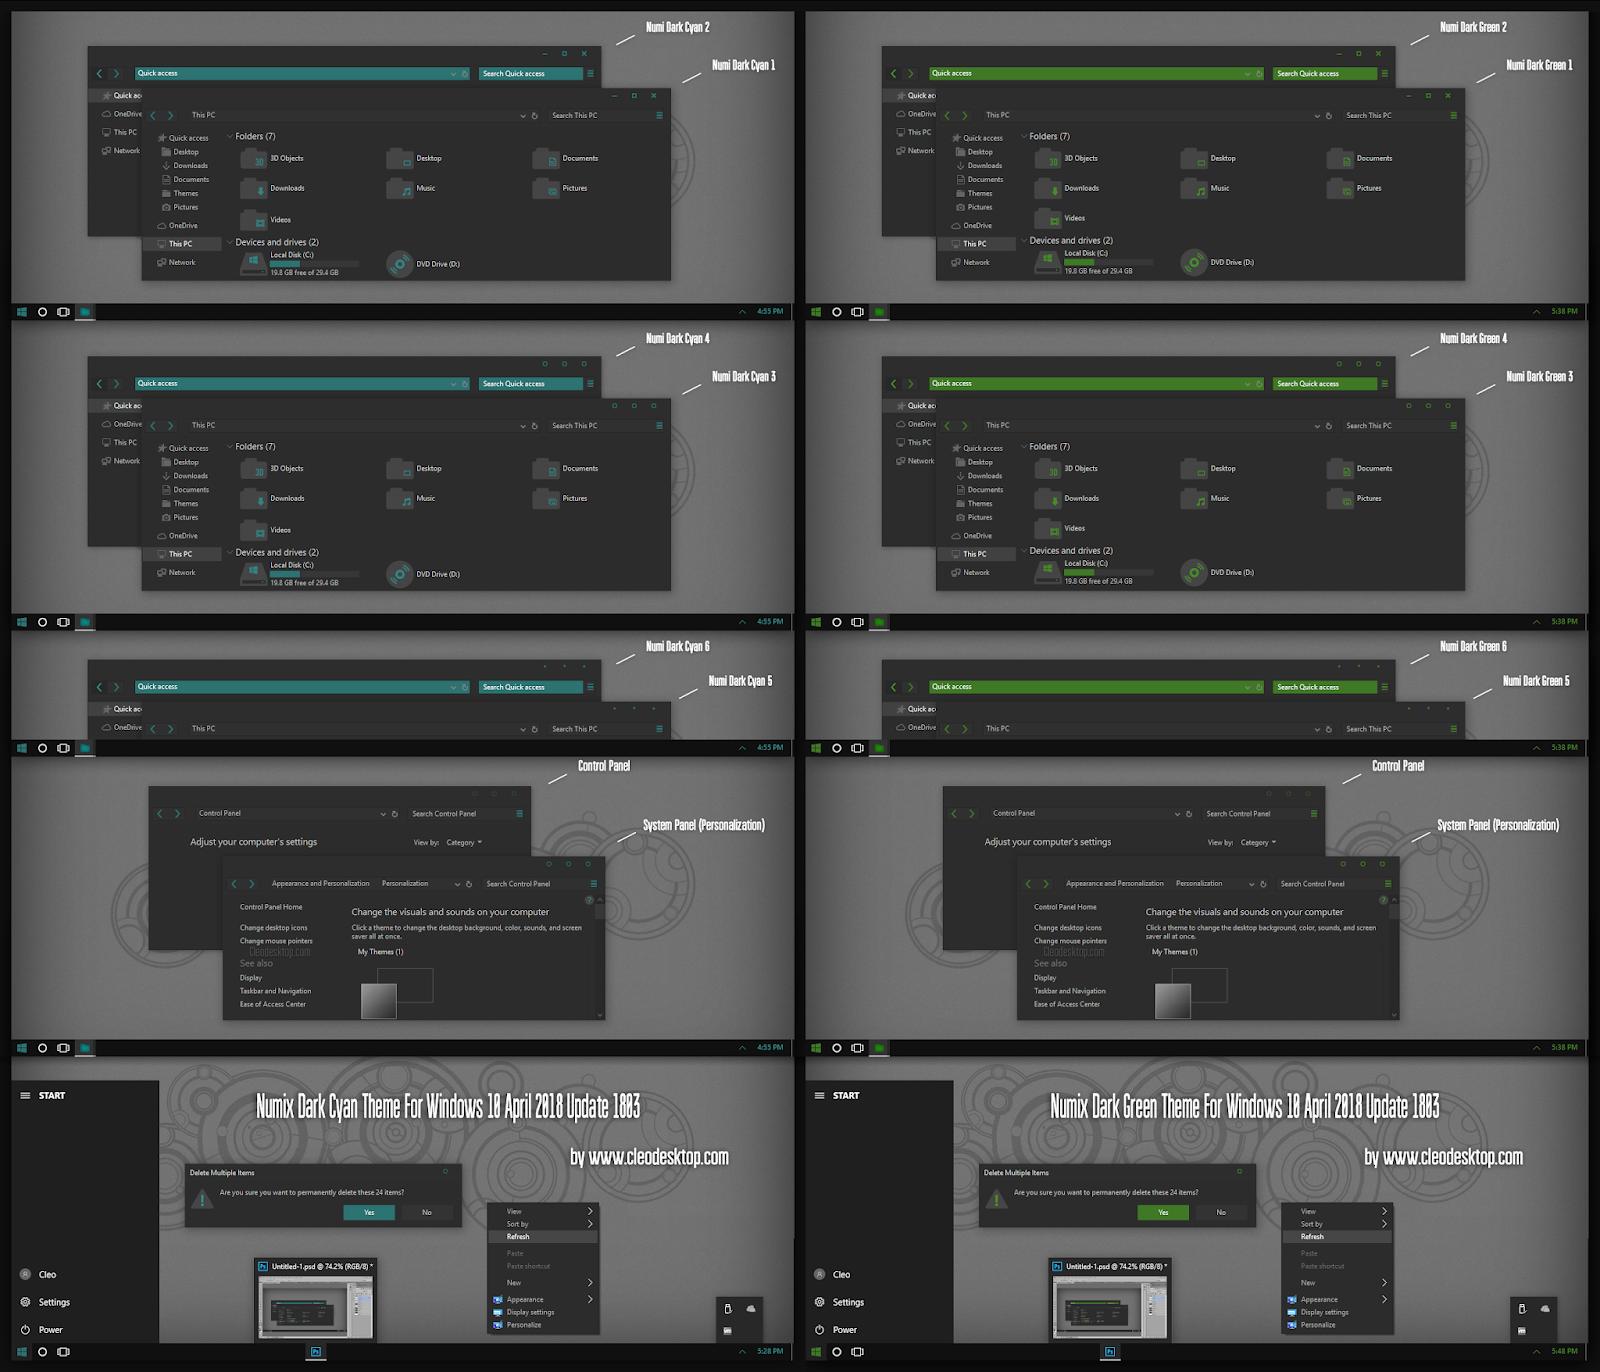 Windows10 Themes I Cleodesktop Numix Dark Cyan And Green Theme Windows10 April 2018 Update 1803 Dark Cyan Green Theme Theme